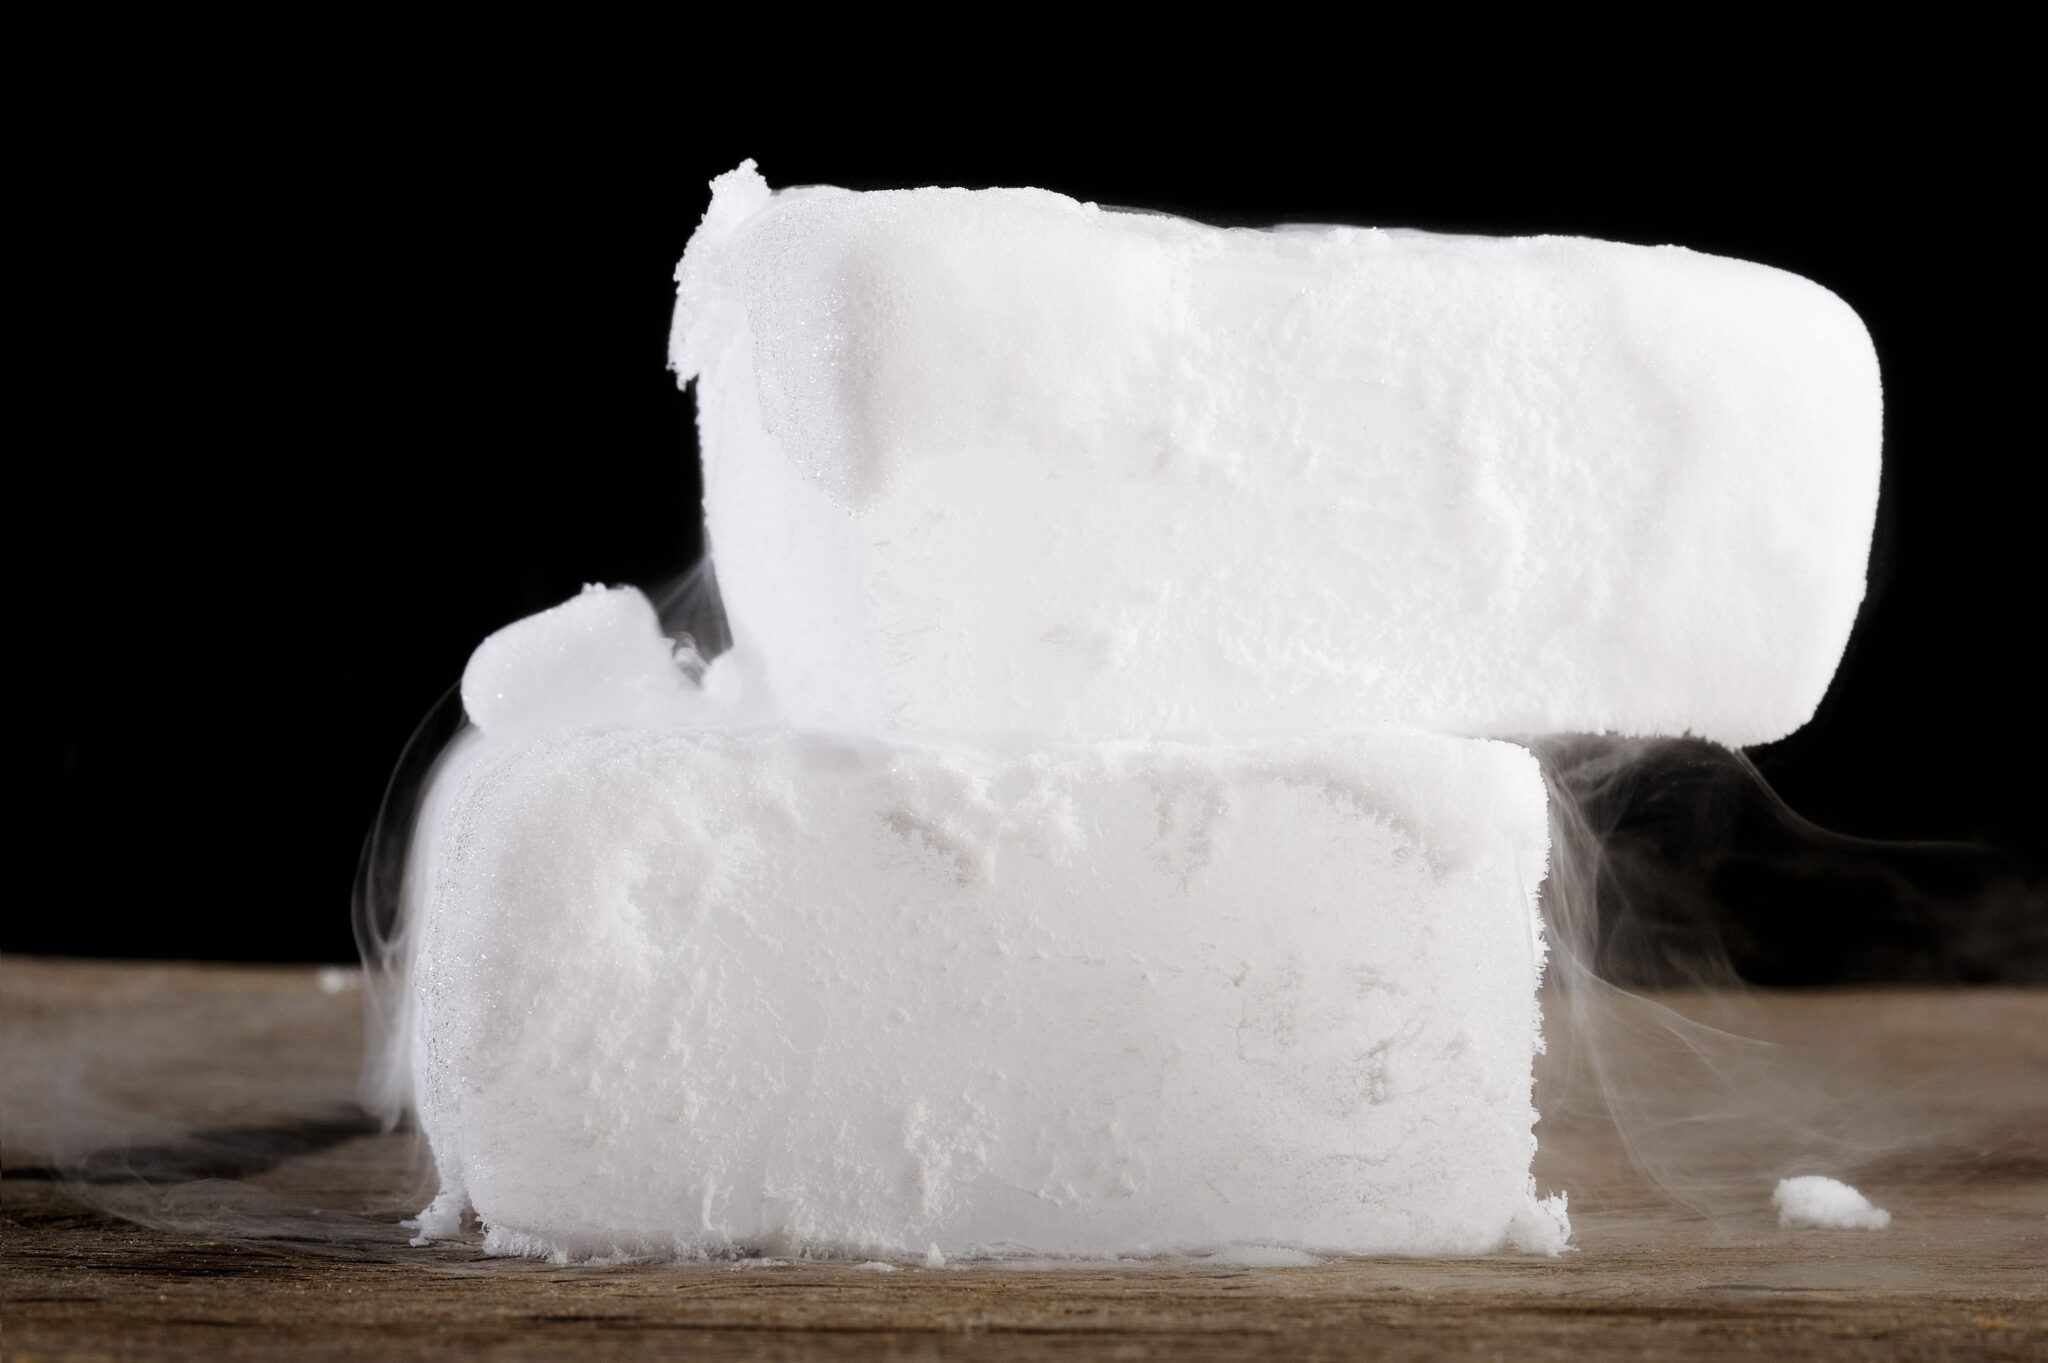 Dry-Ice-Blocks-and-Pellets